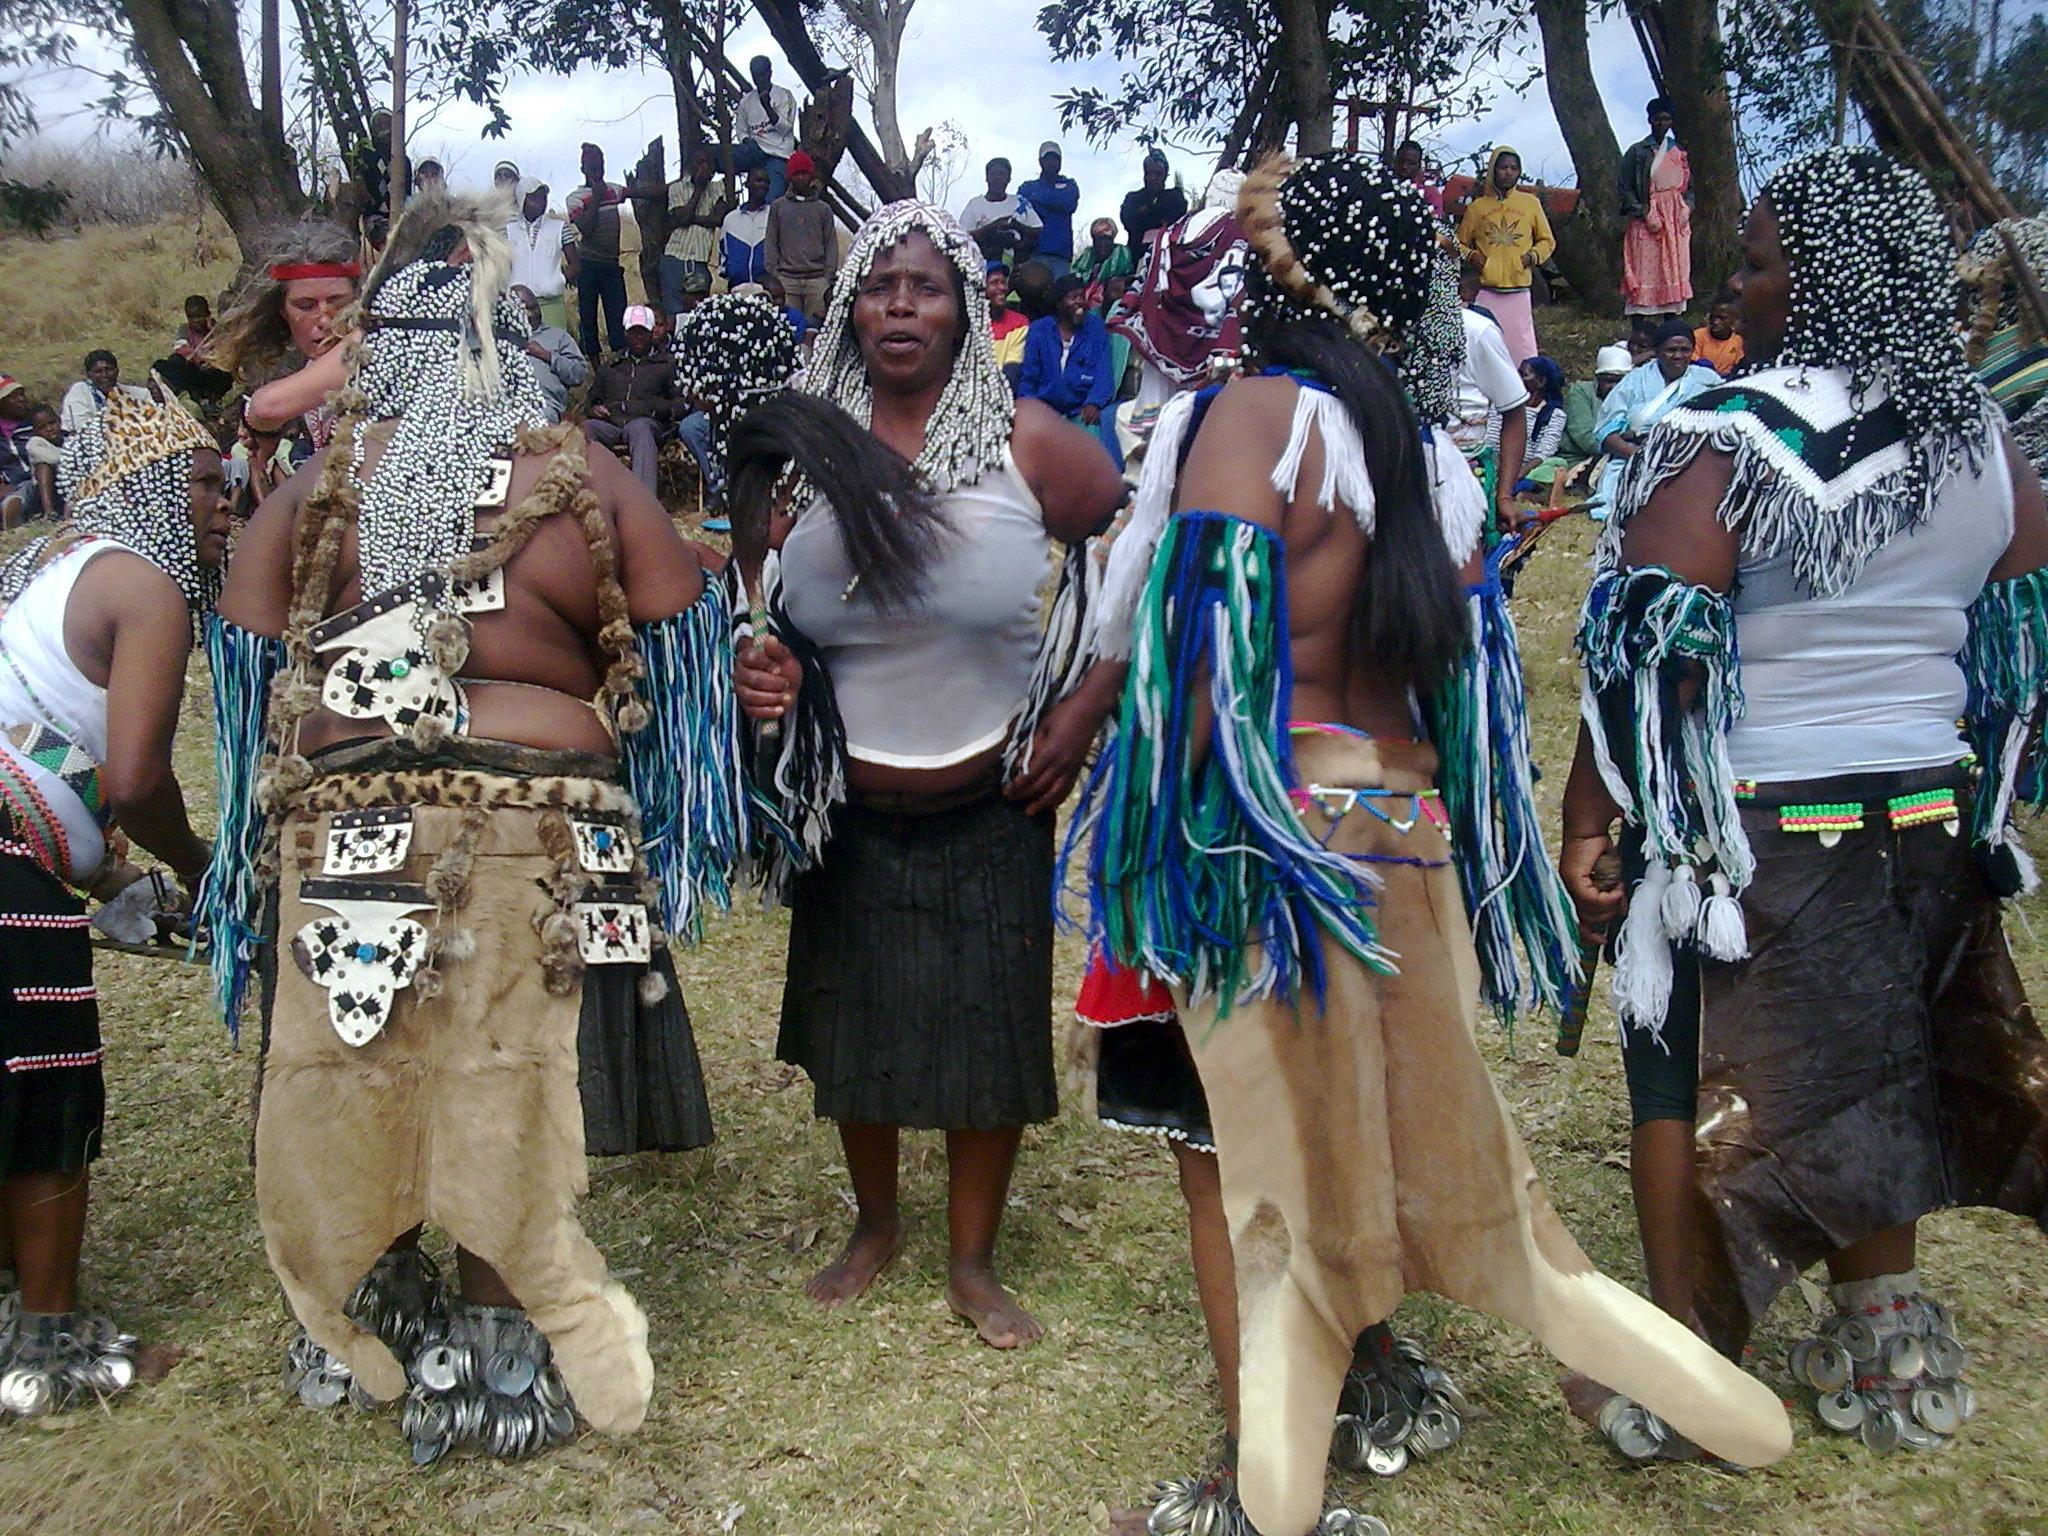 Annual Sangoma ceremony in Zululand /static/Zulu/Image017.jpg